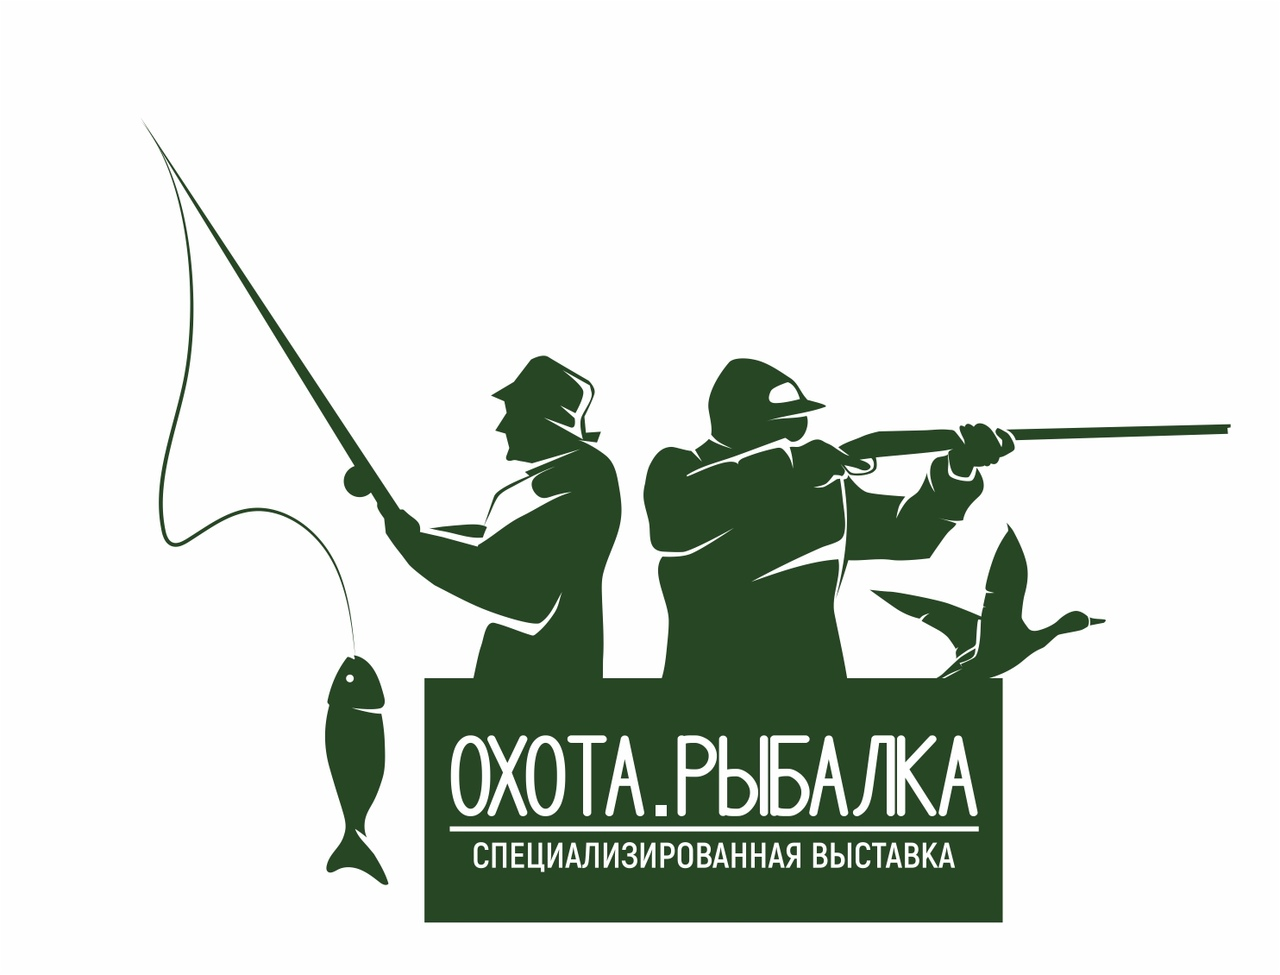 "Афиша Воронеж Выставка-ярмарка ""Охота. Рыбалка 2019"" Воронеж"